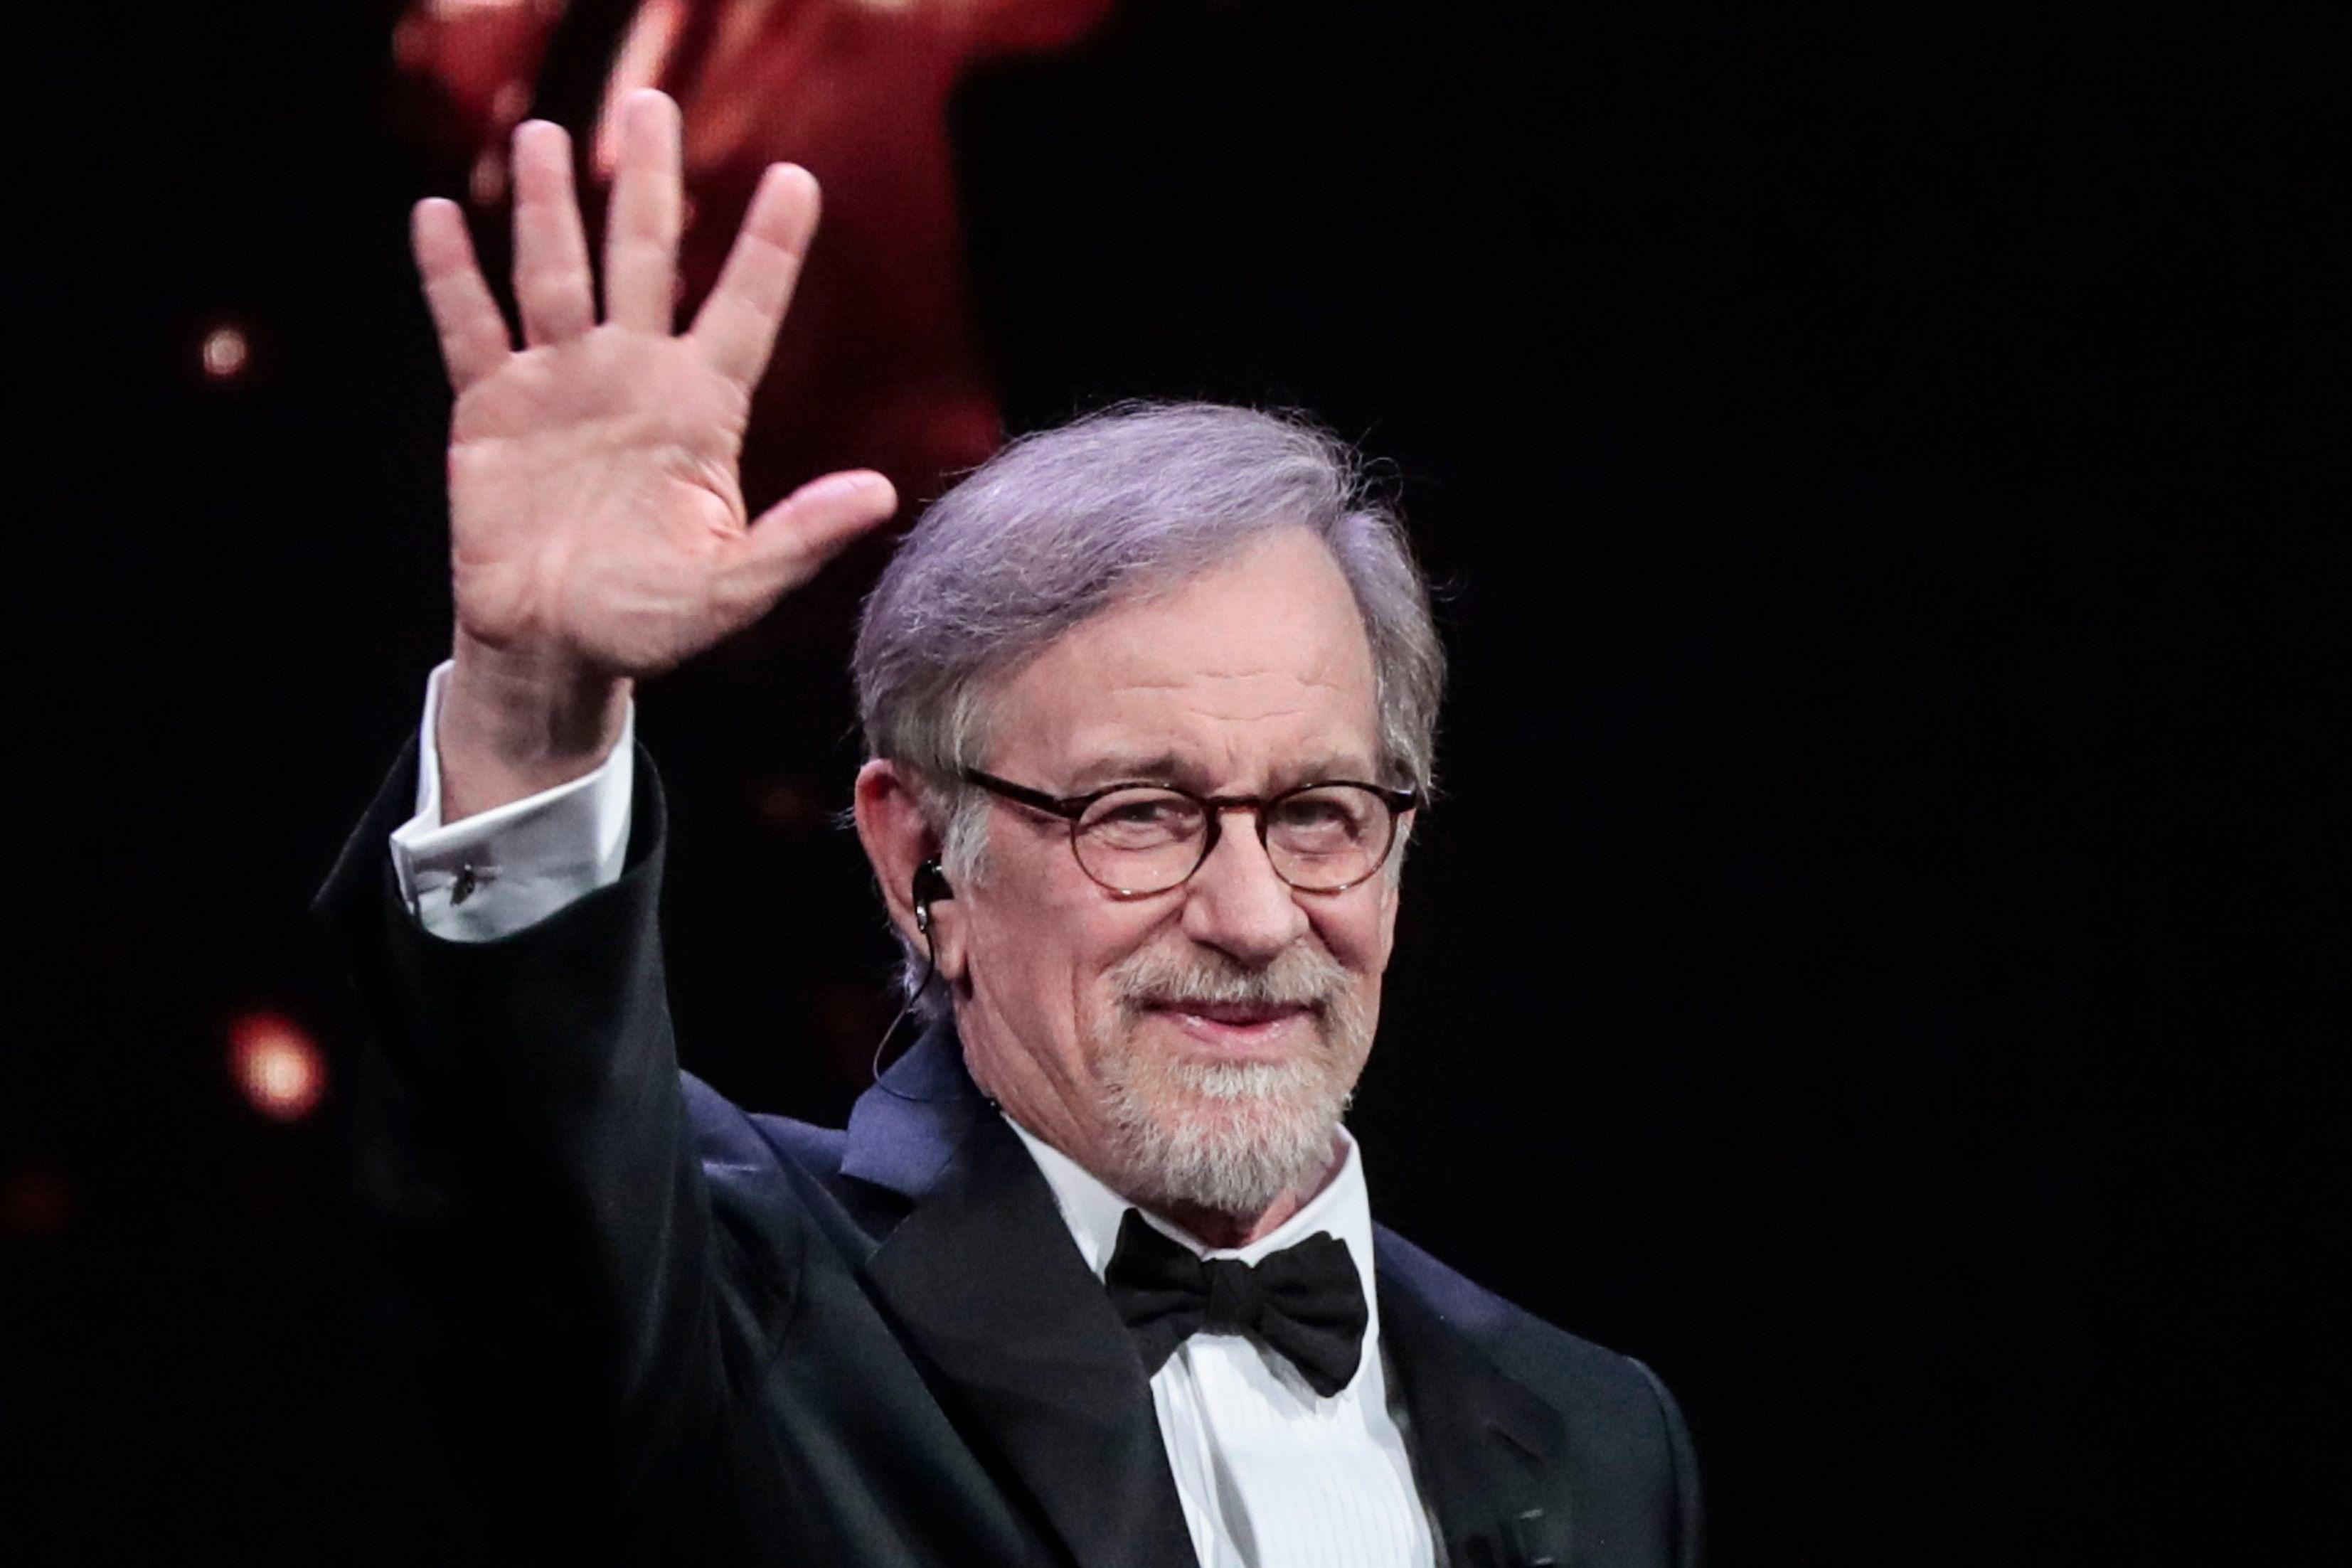 Steven Spielberg: Netflix Movies and Streaming Services 'Deserve an Emmy, but Not an Oscar'